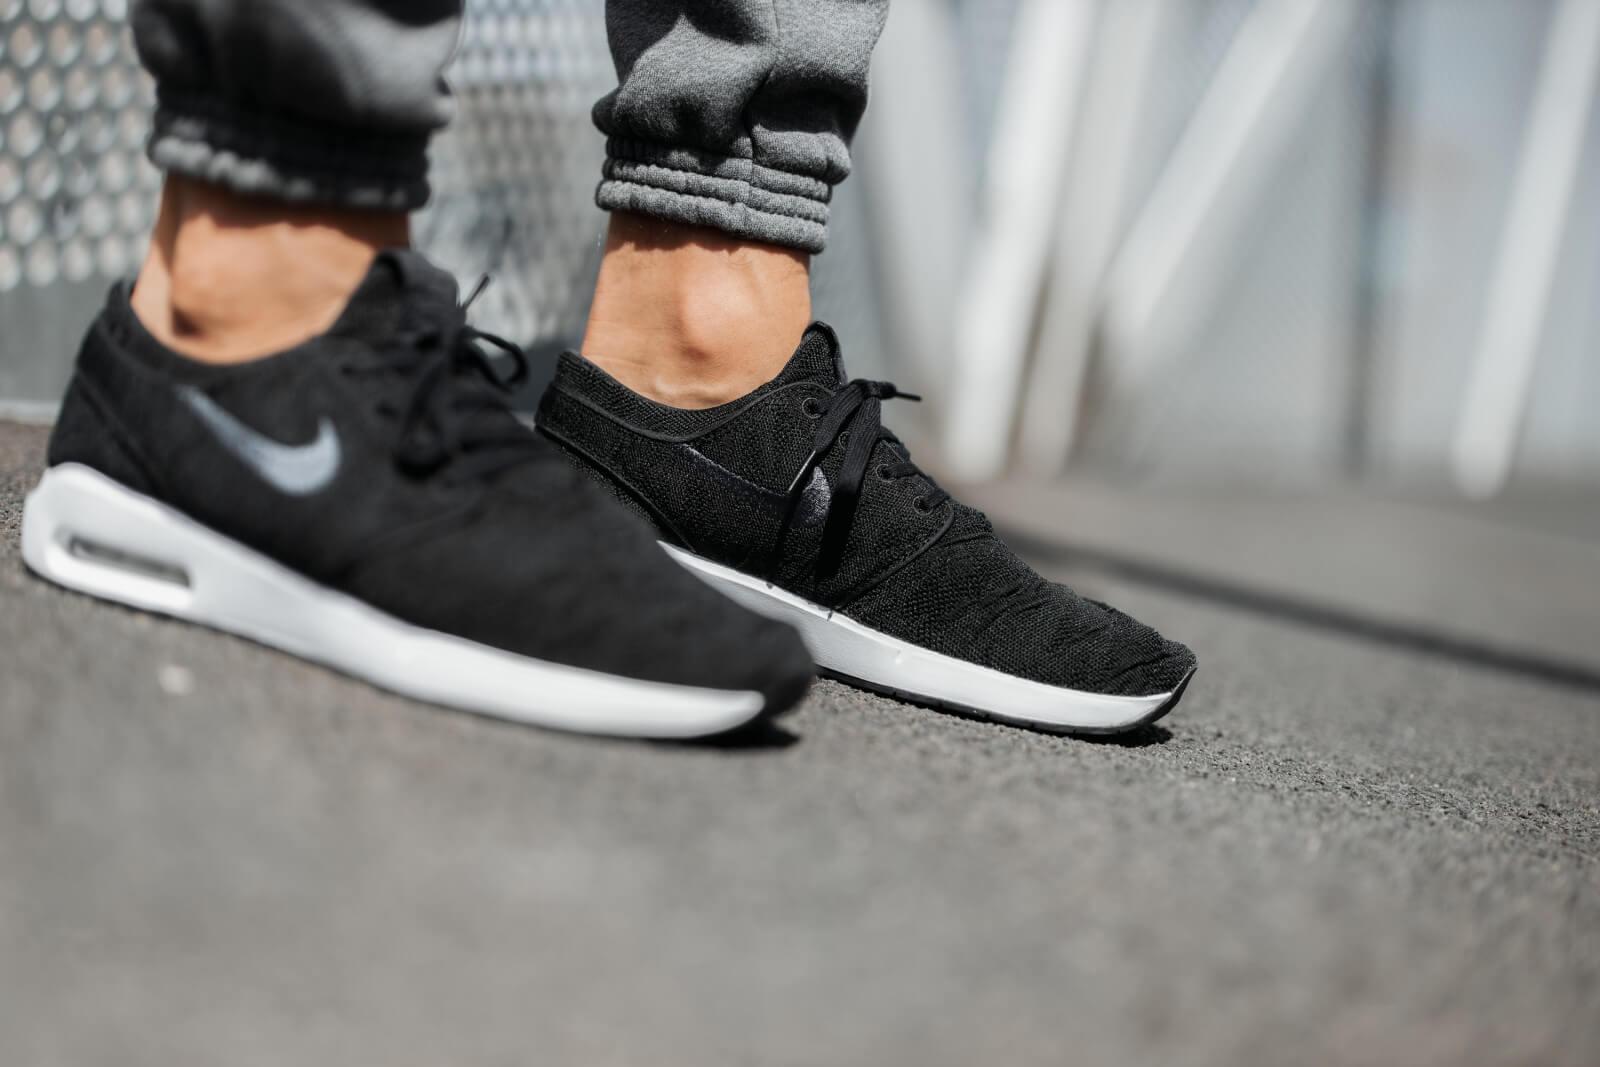 Nike SB Air Max Janoski 2 Black/Anthracite-White